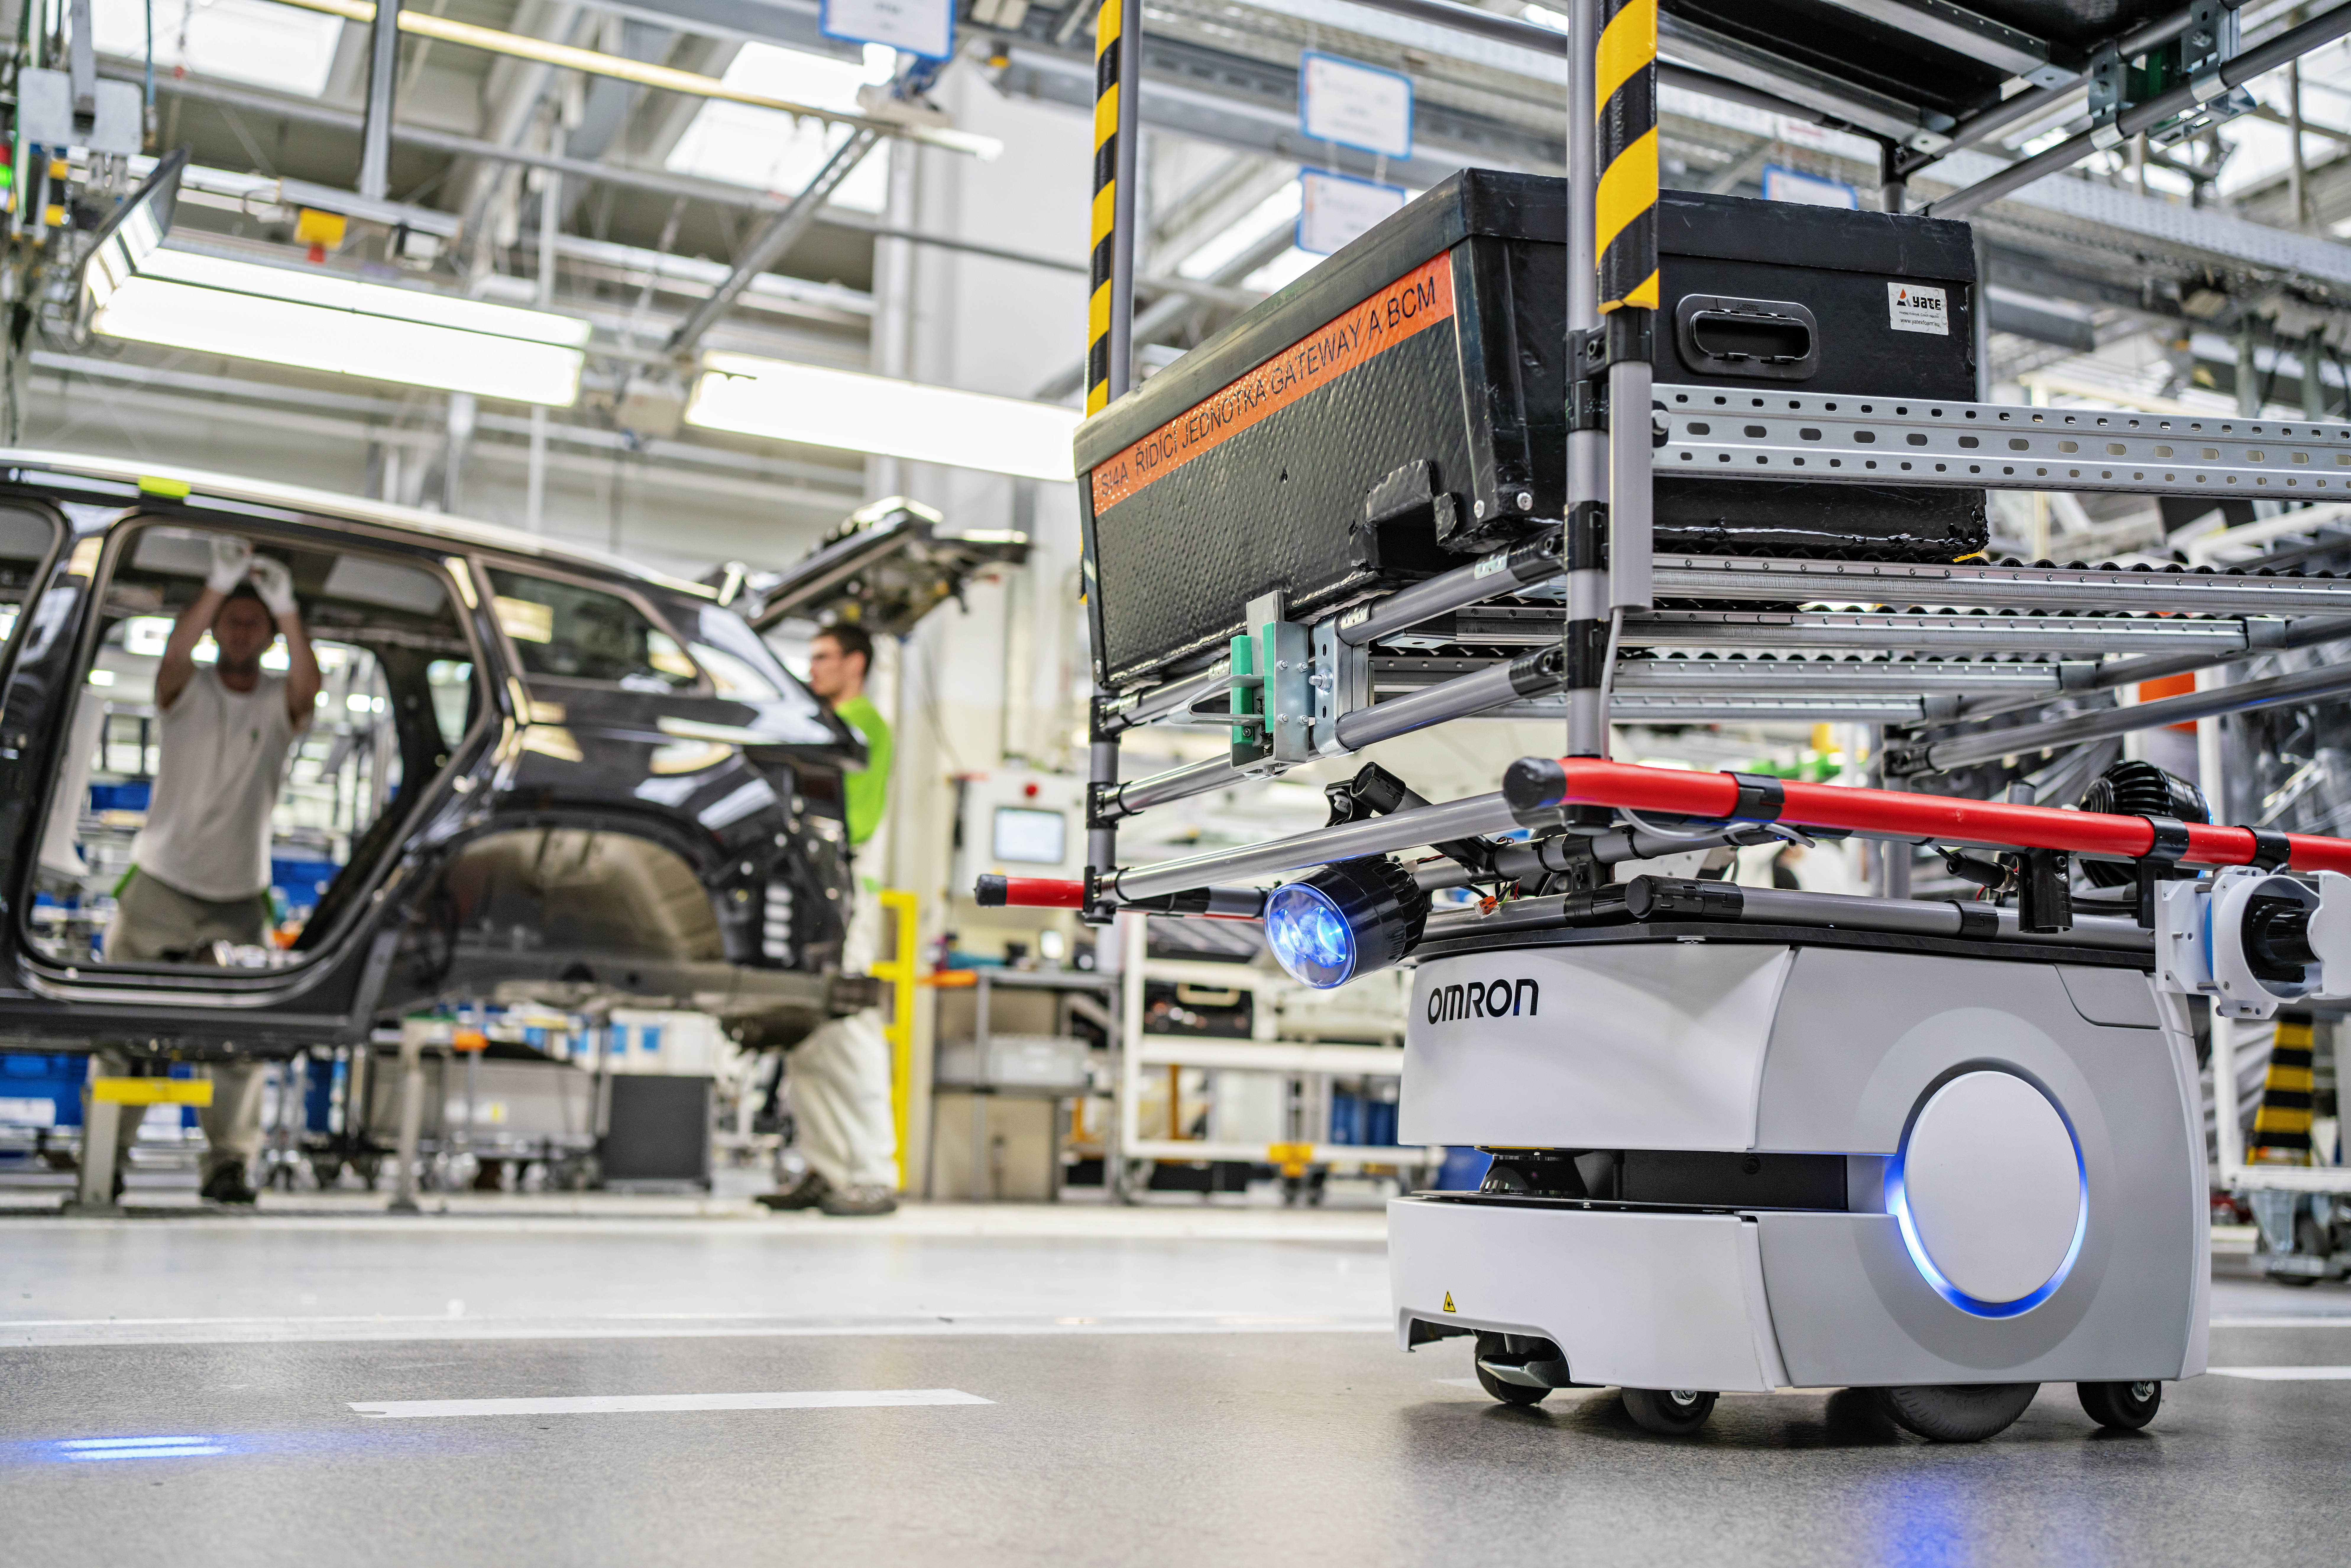 SKODA AUTO sets production record in Kvasiny - Image 1